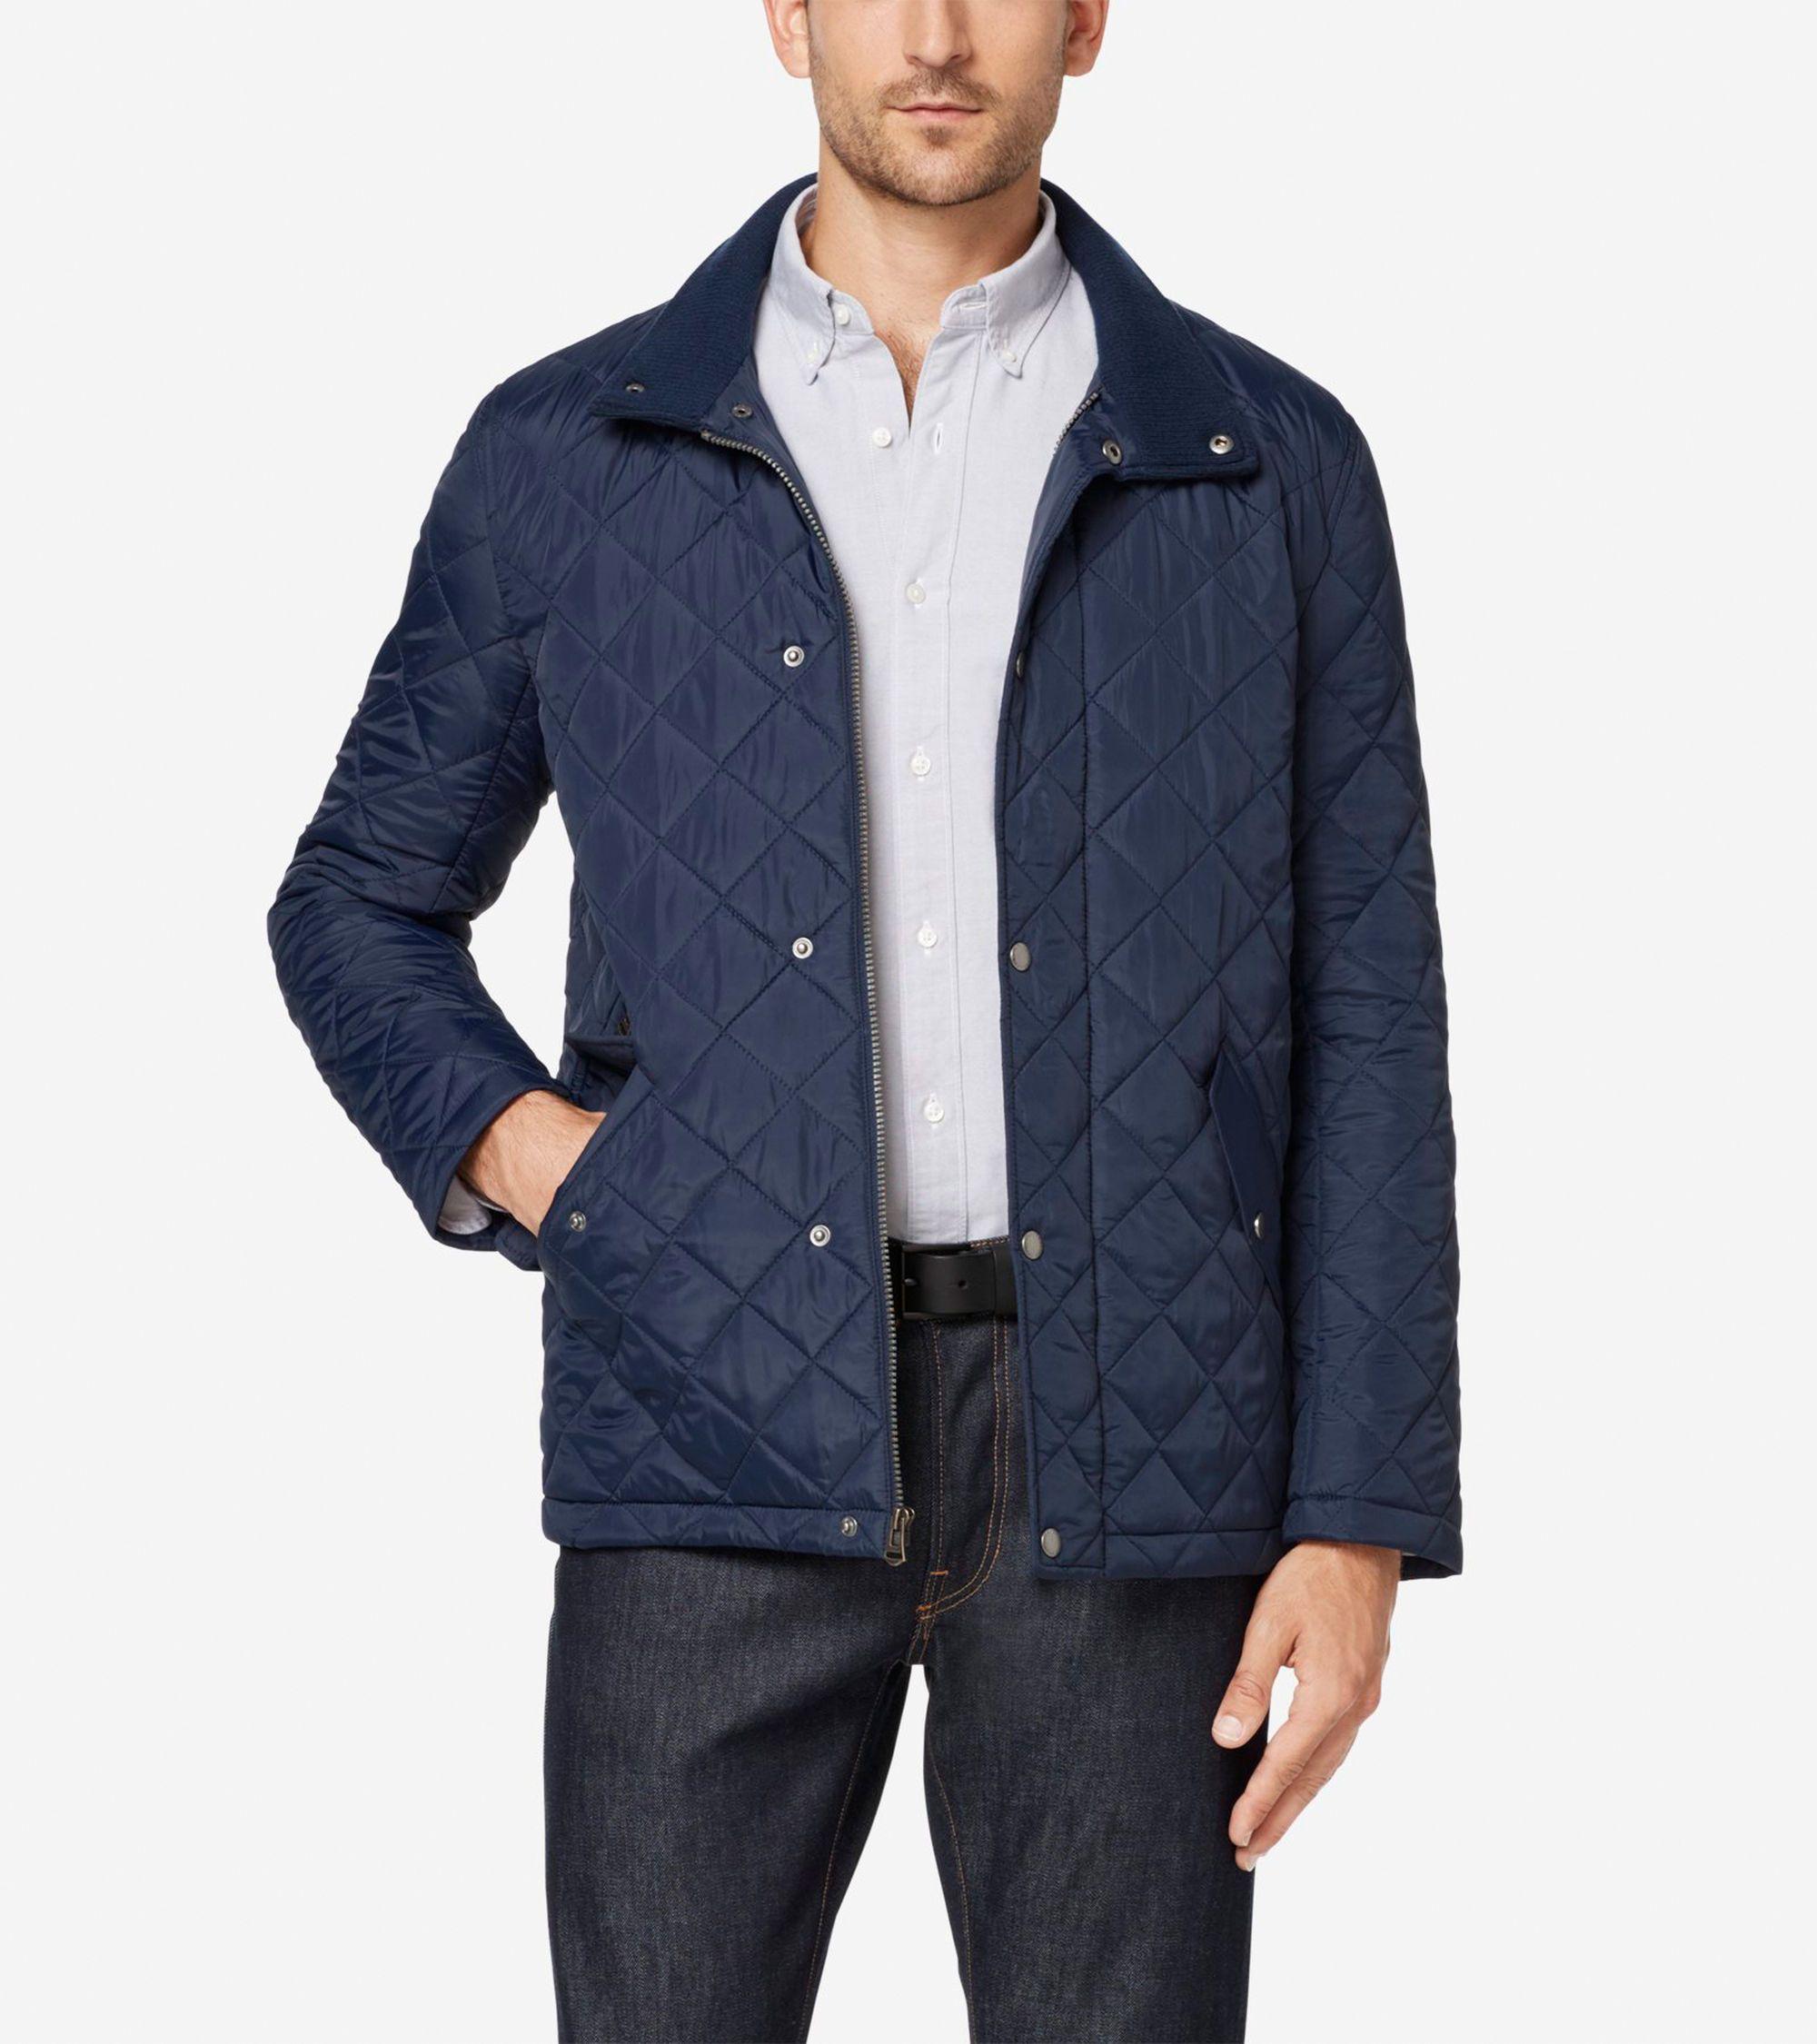 Quilted Barn Jacket Jackets Men S Coats And Jackets Fall Jackets